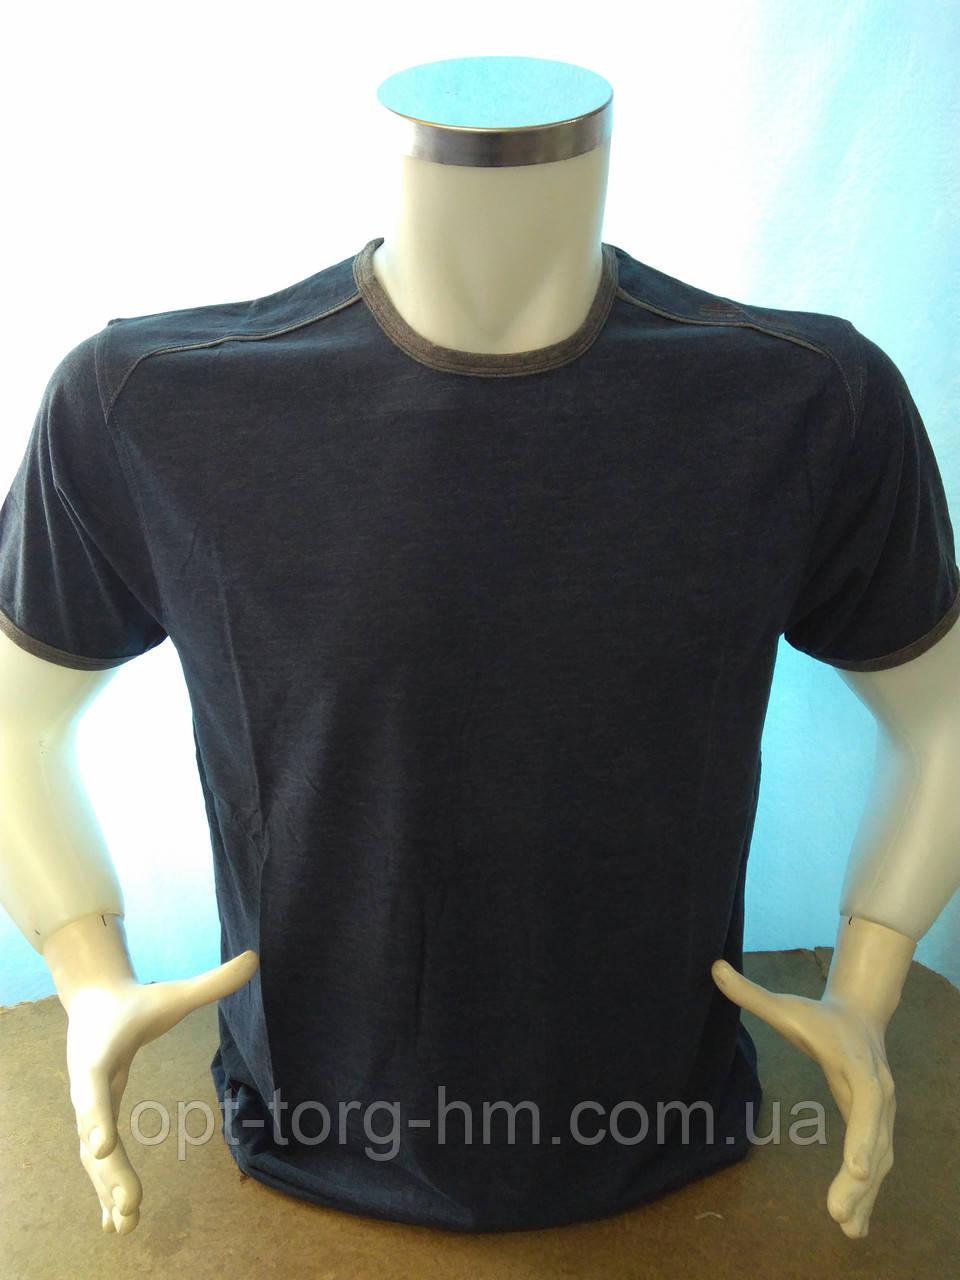 Мужская футболка увеличенная